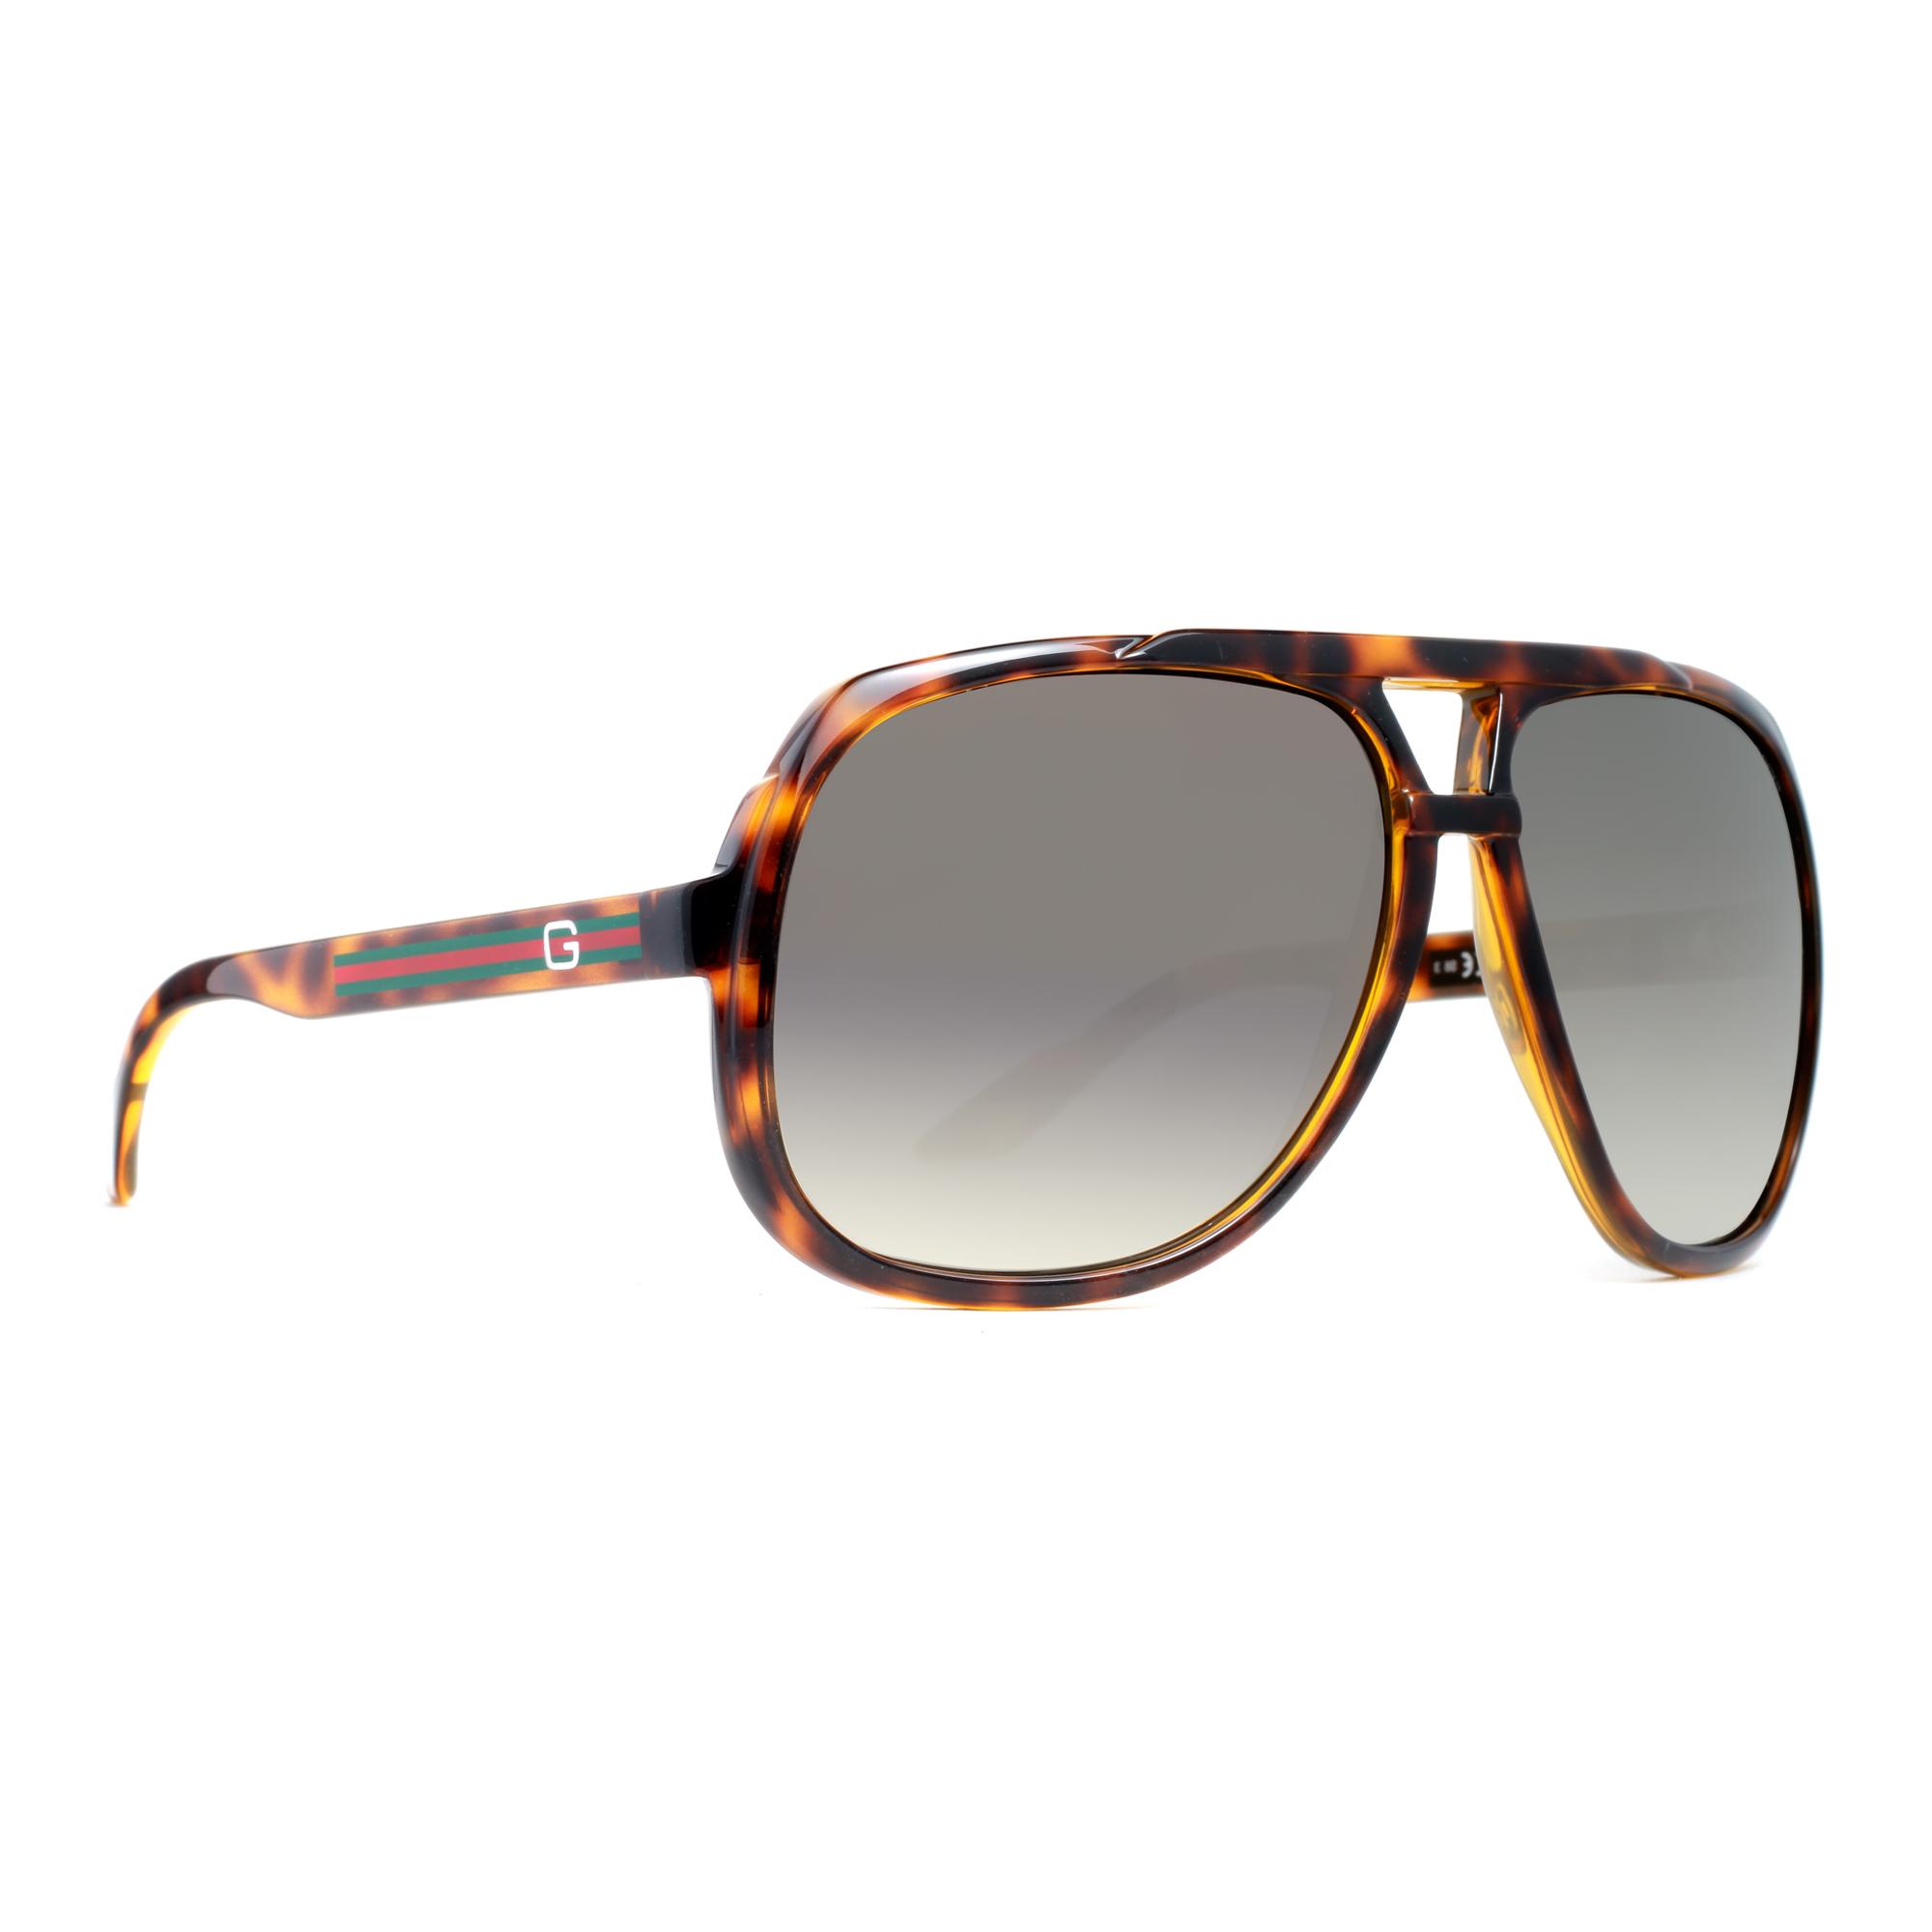 a5668de6384 Gucci Aviator Sunglasses 1622 S